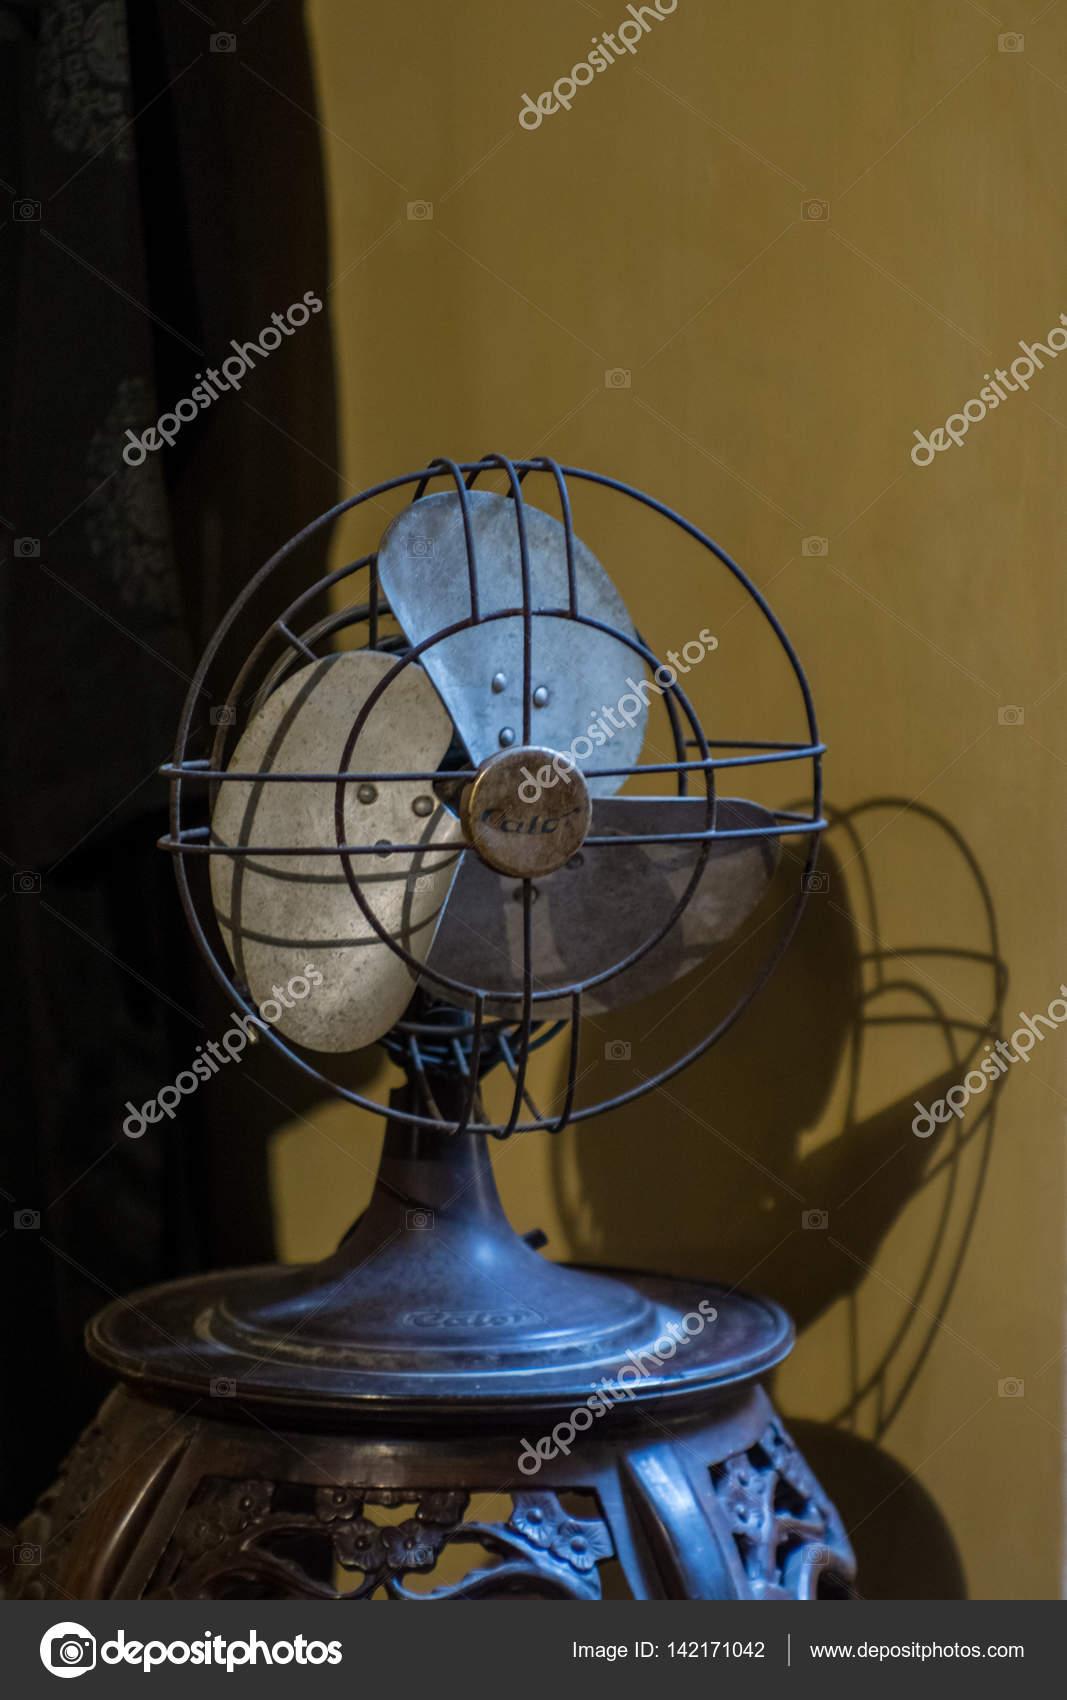 The Antique Metal Desk Fan Stock Photo